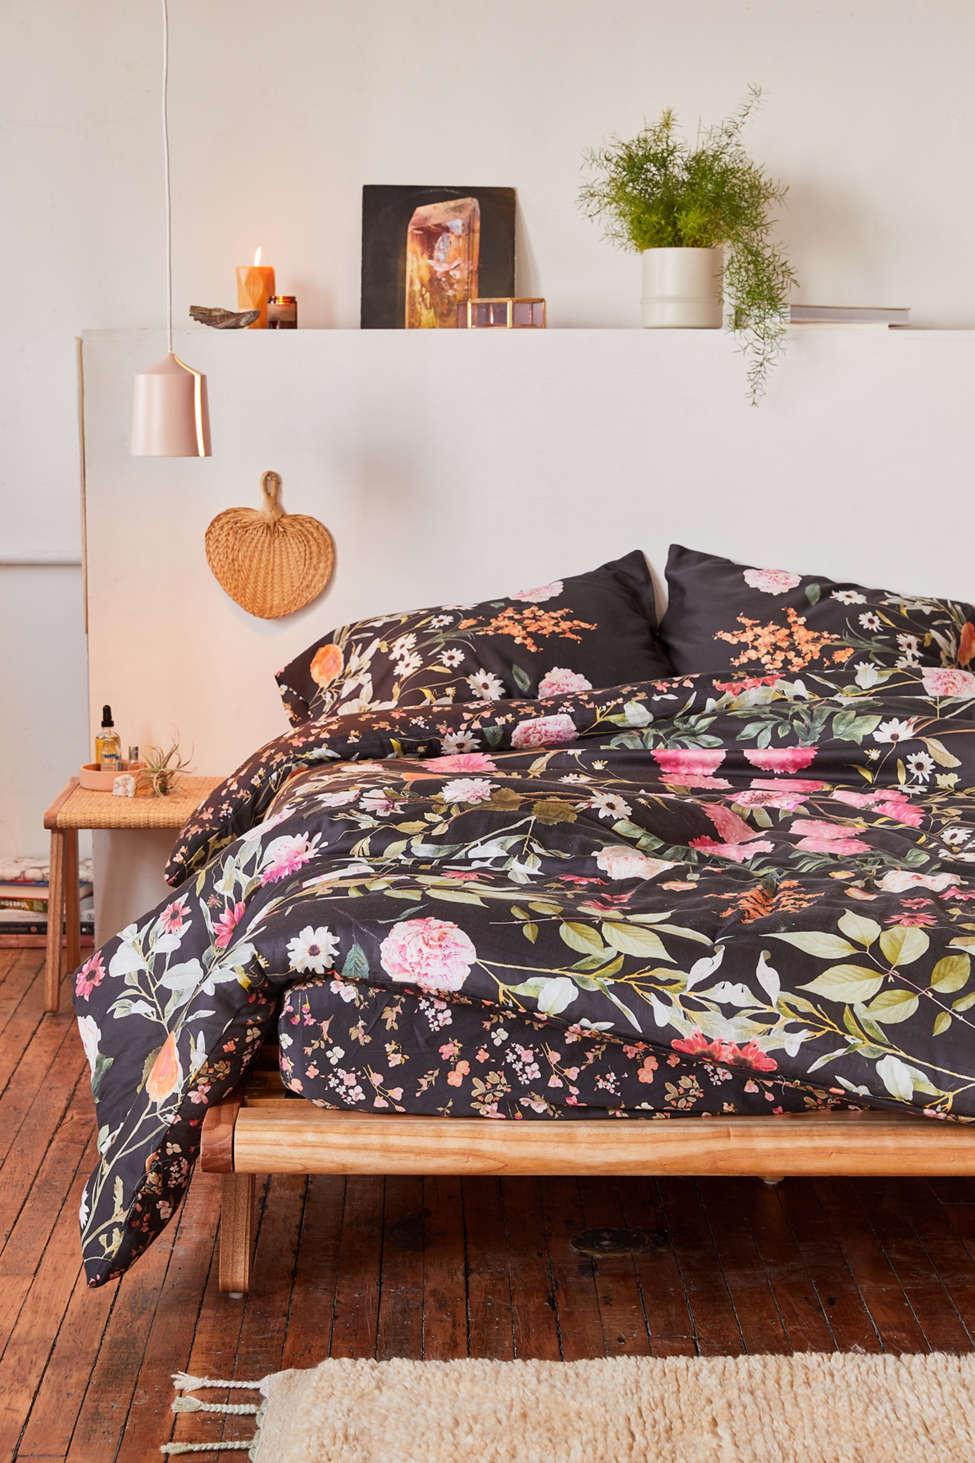 Slide View: 1: Daniella Floral Comforter Snooze Set